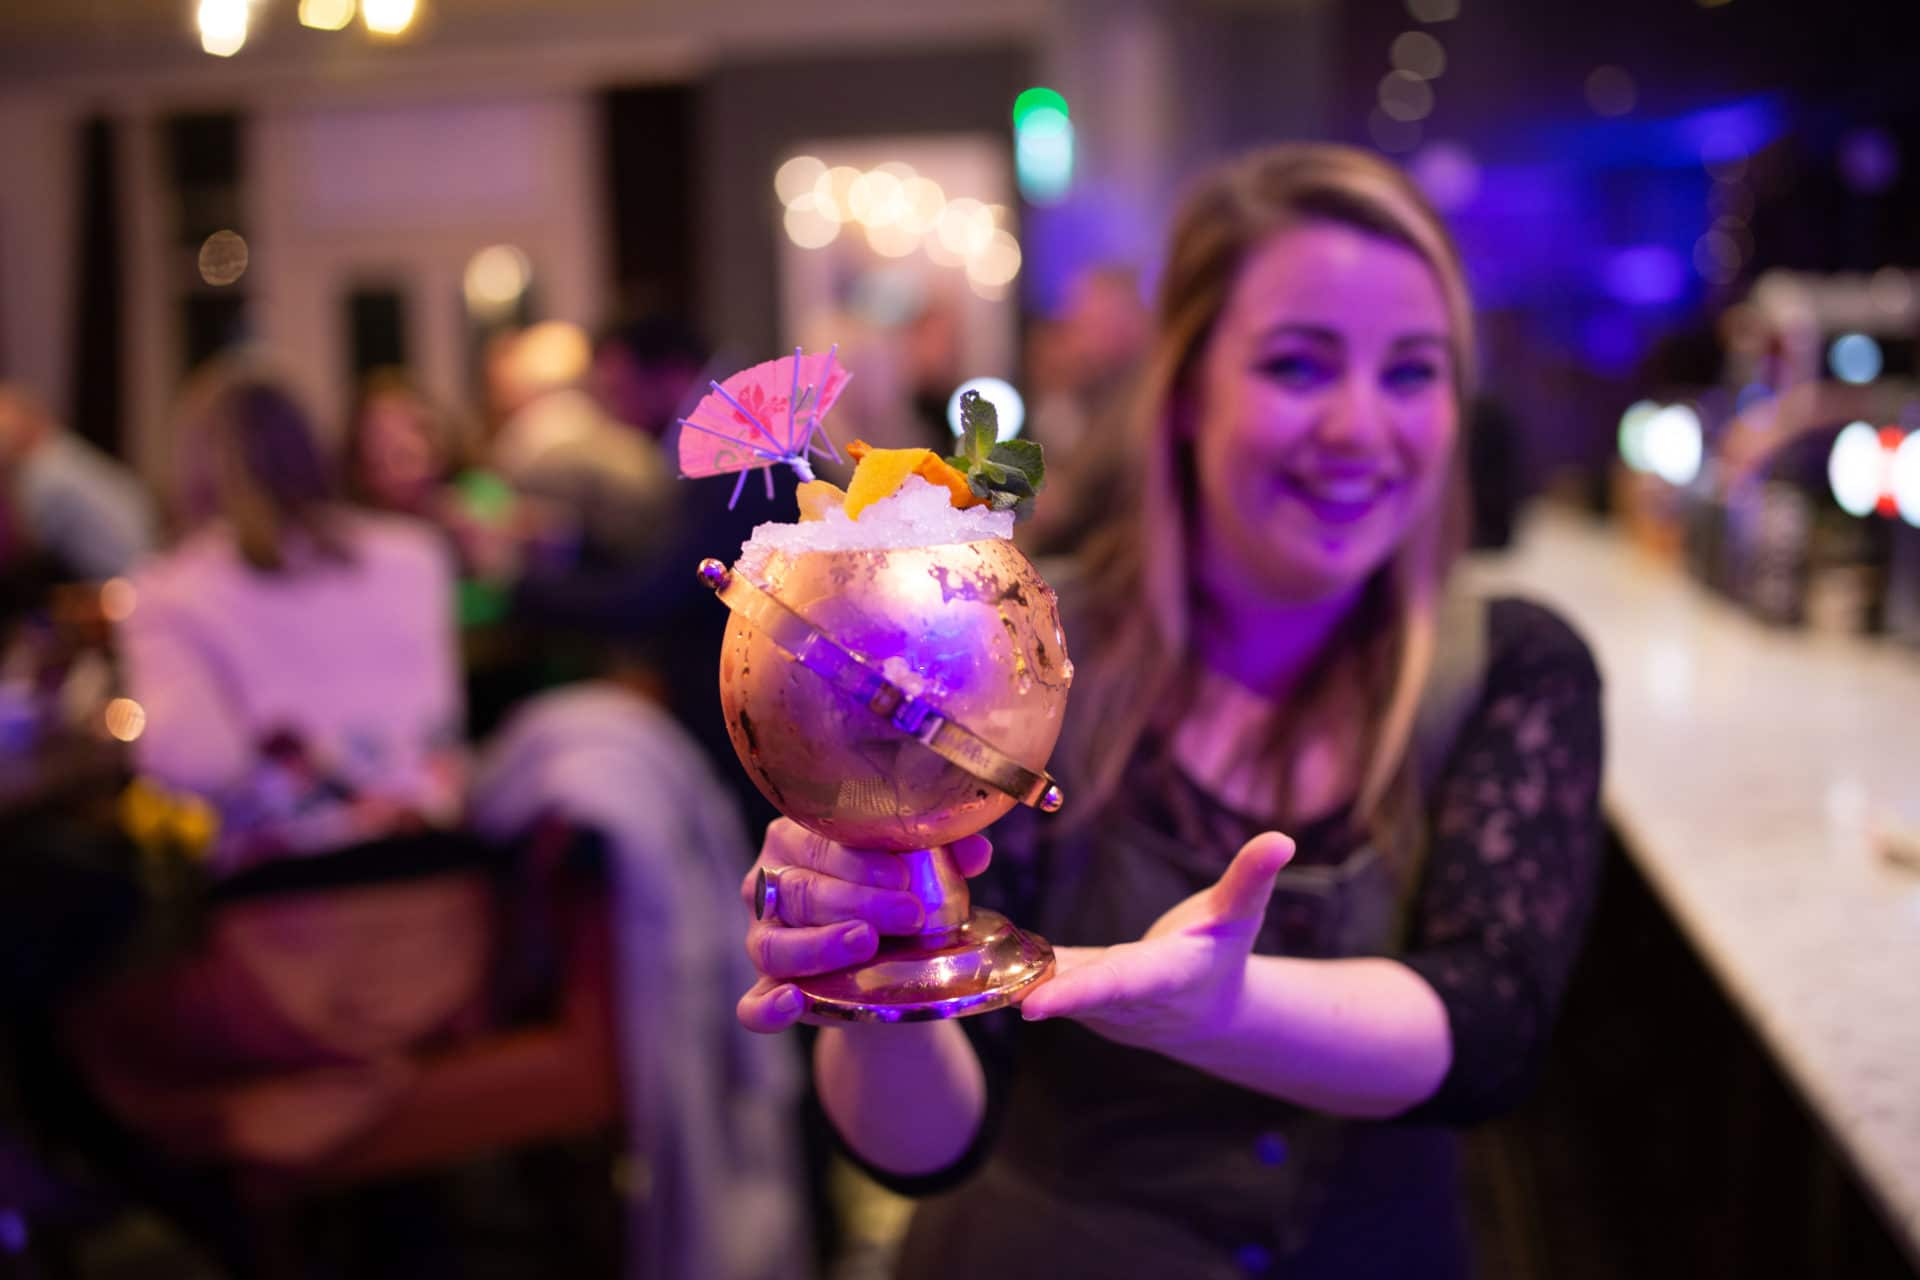 A Happy Customer enjoying a cocktail